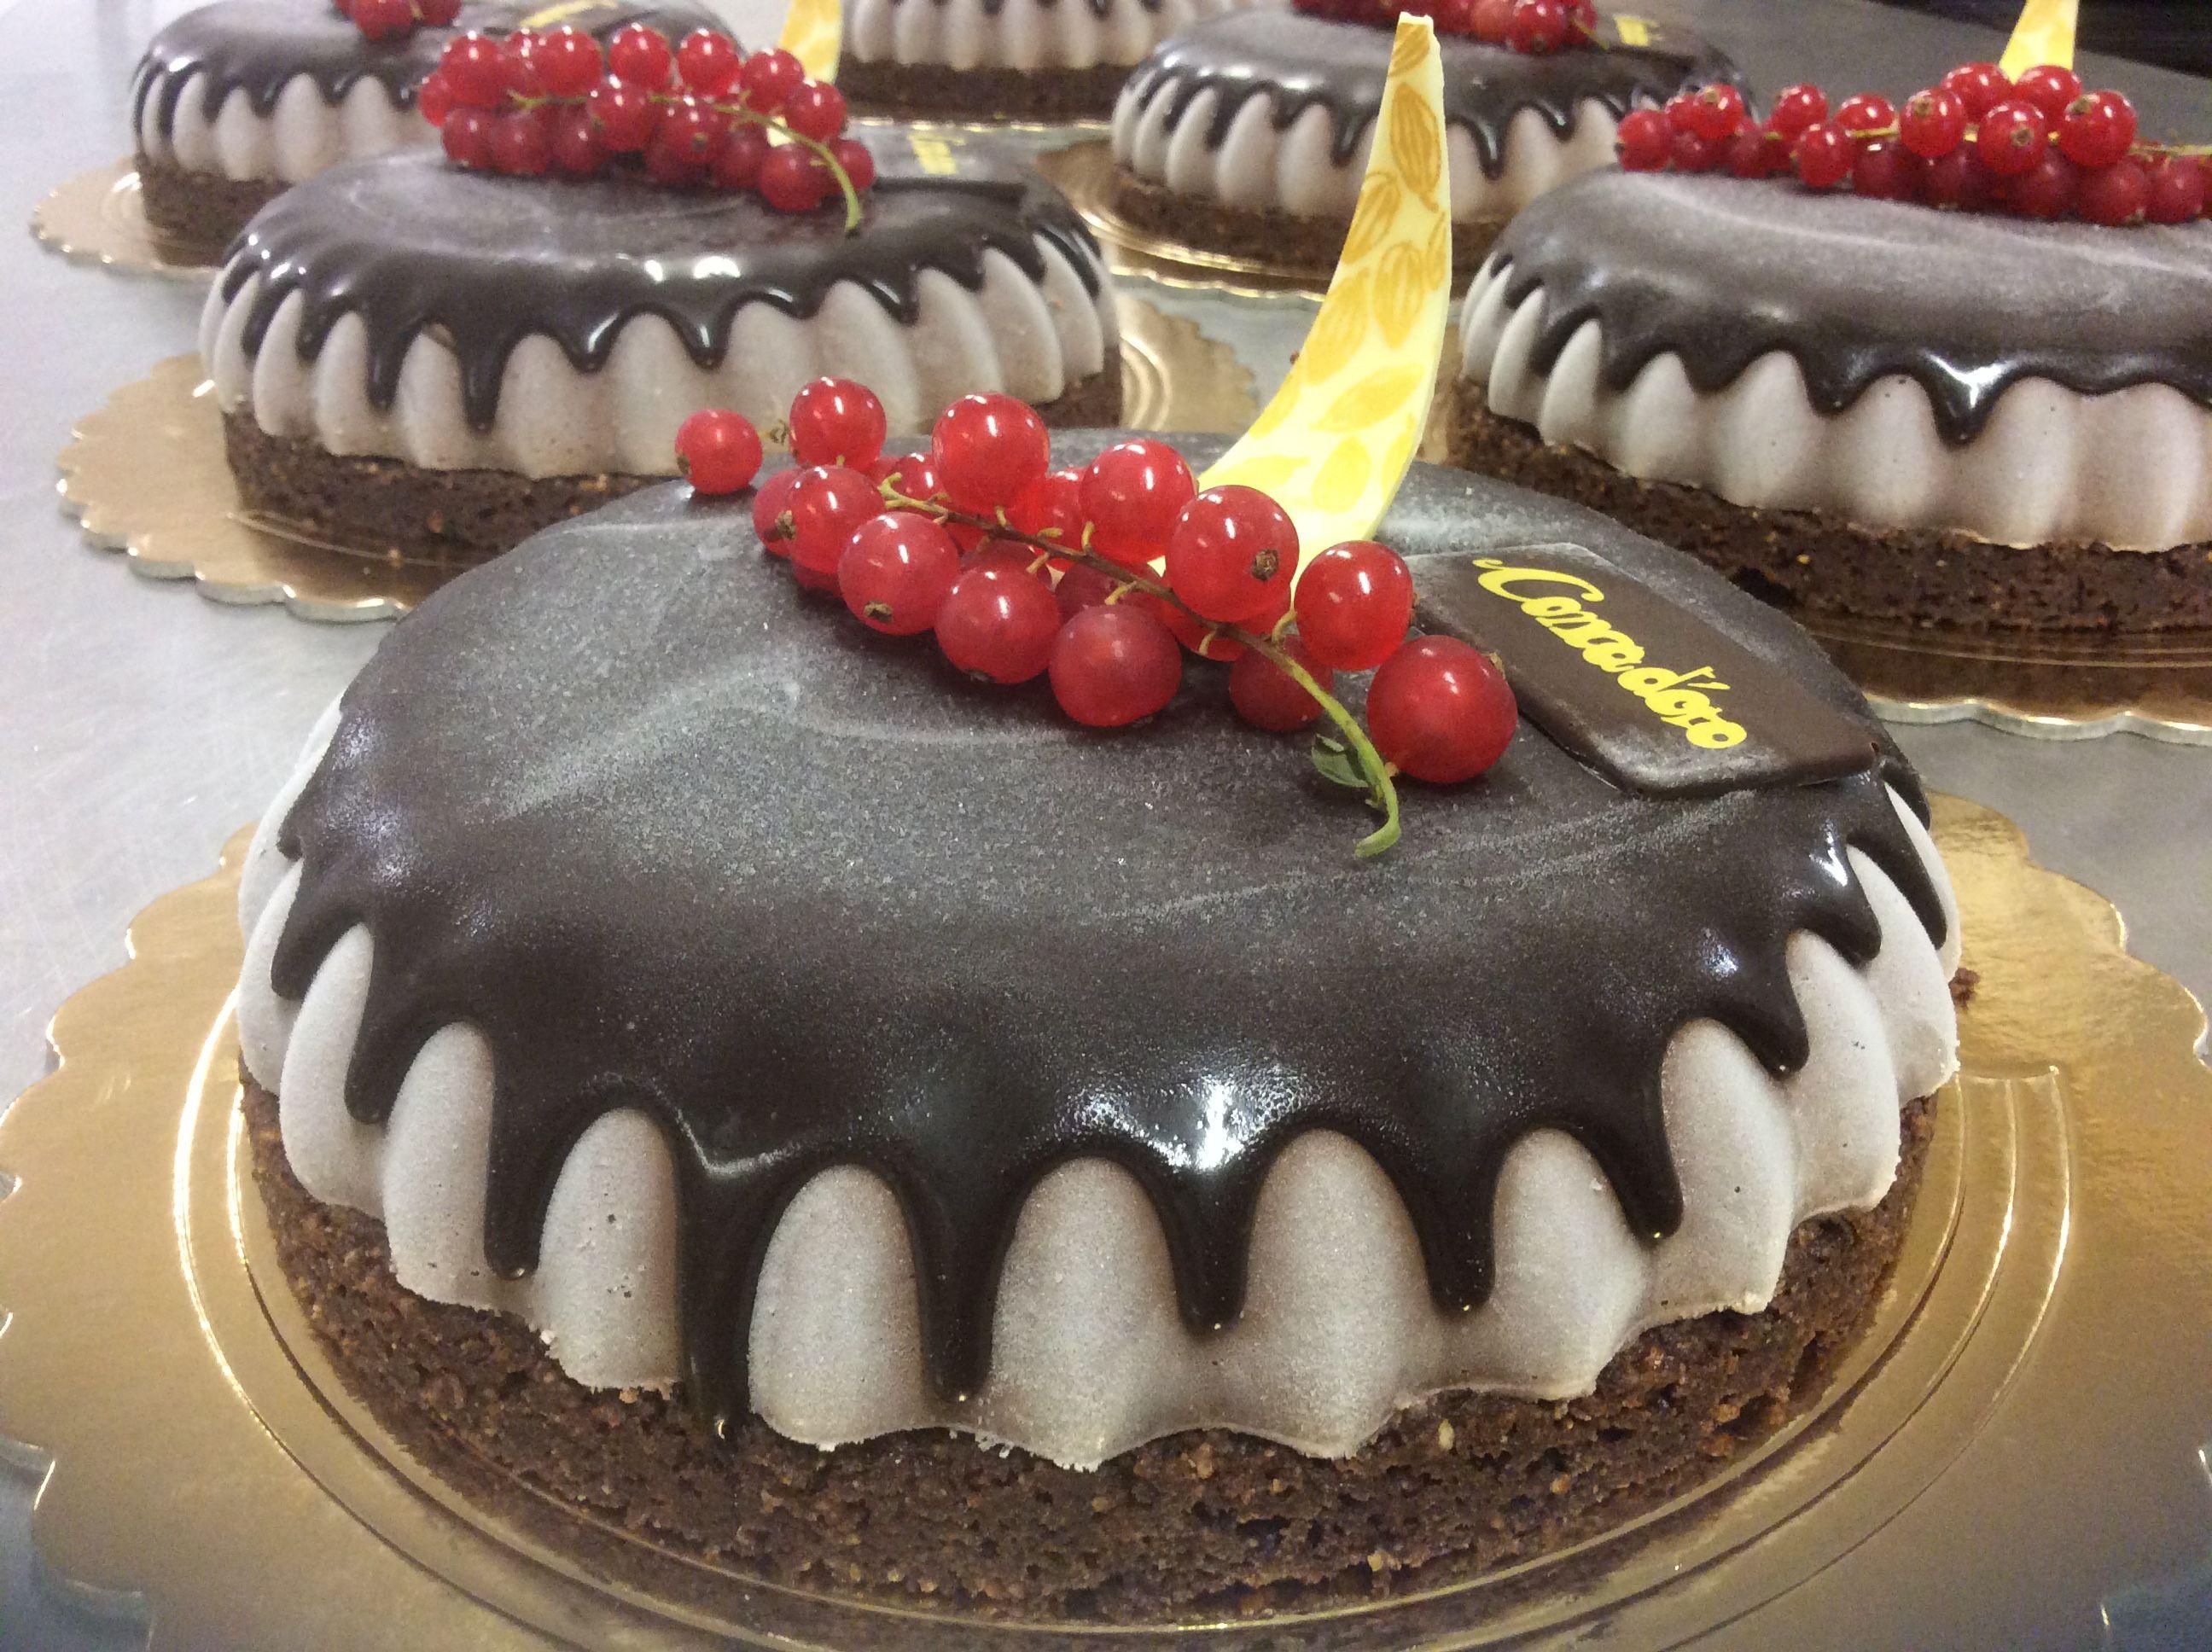 CalaViolina Panna cotta cioccolato 80% CACAO del Mexico, streuzel al CACAO e mandorle